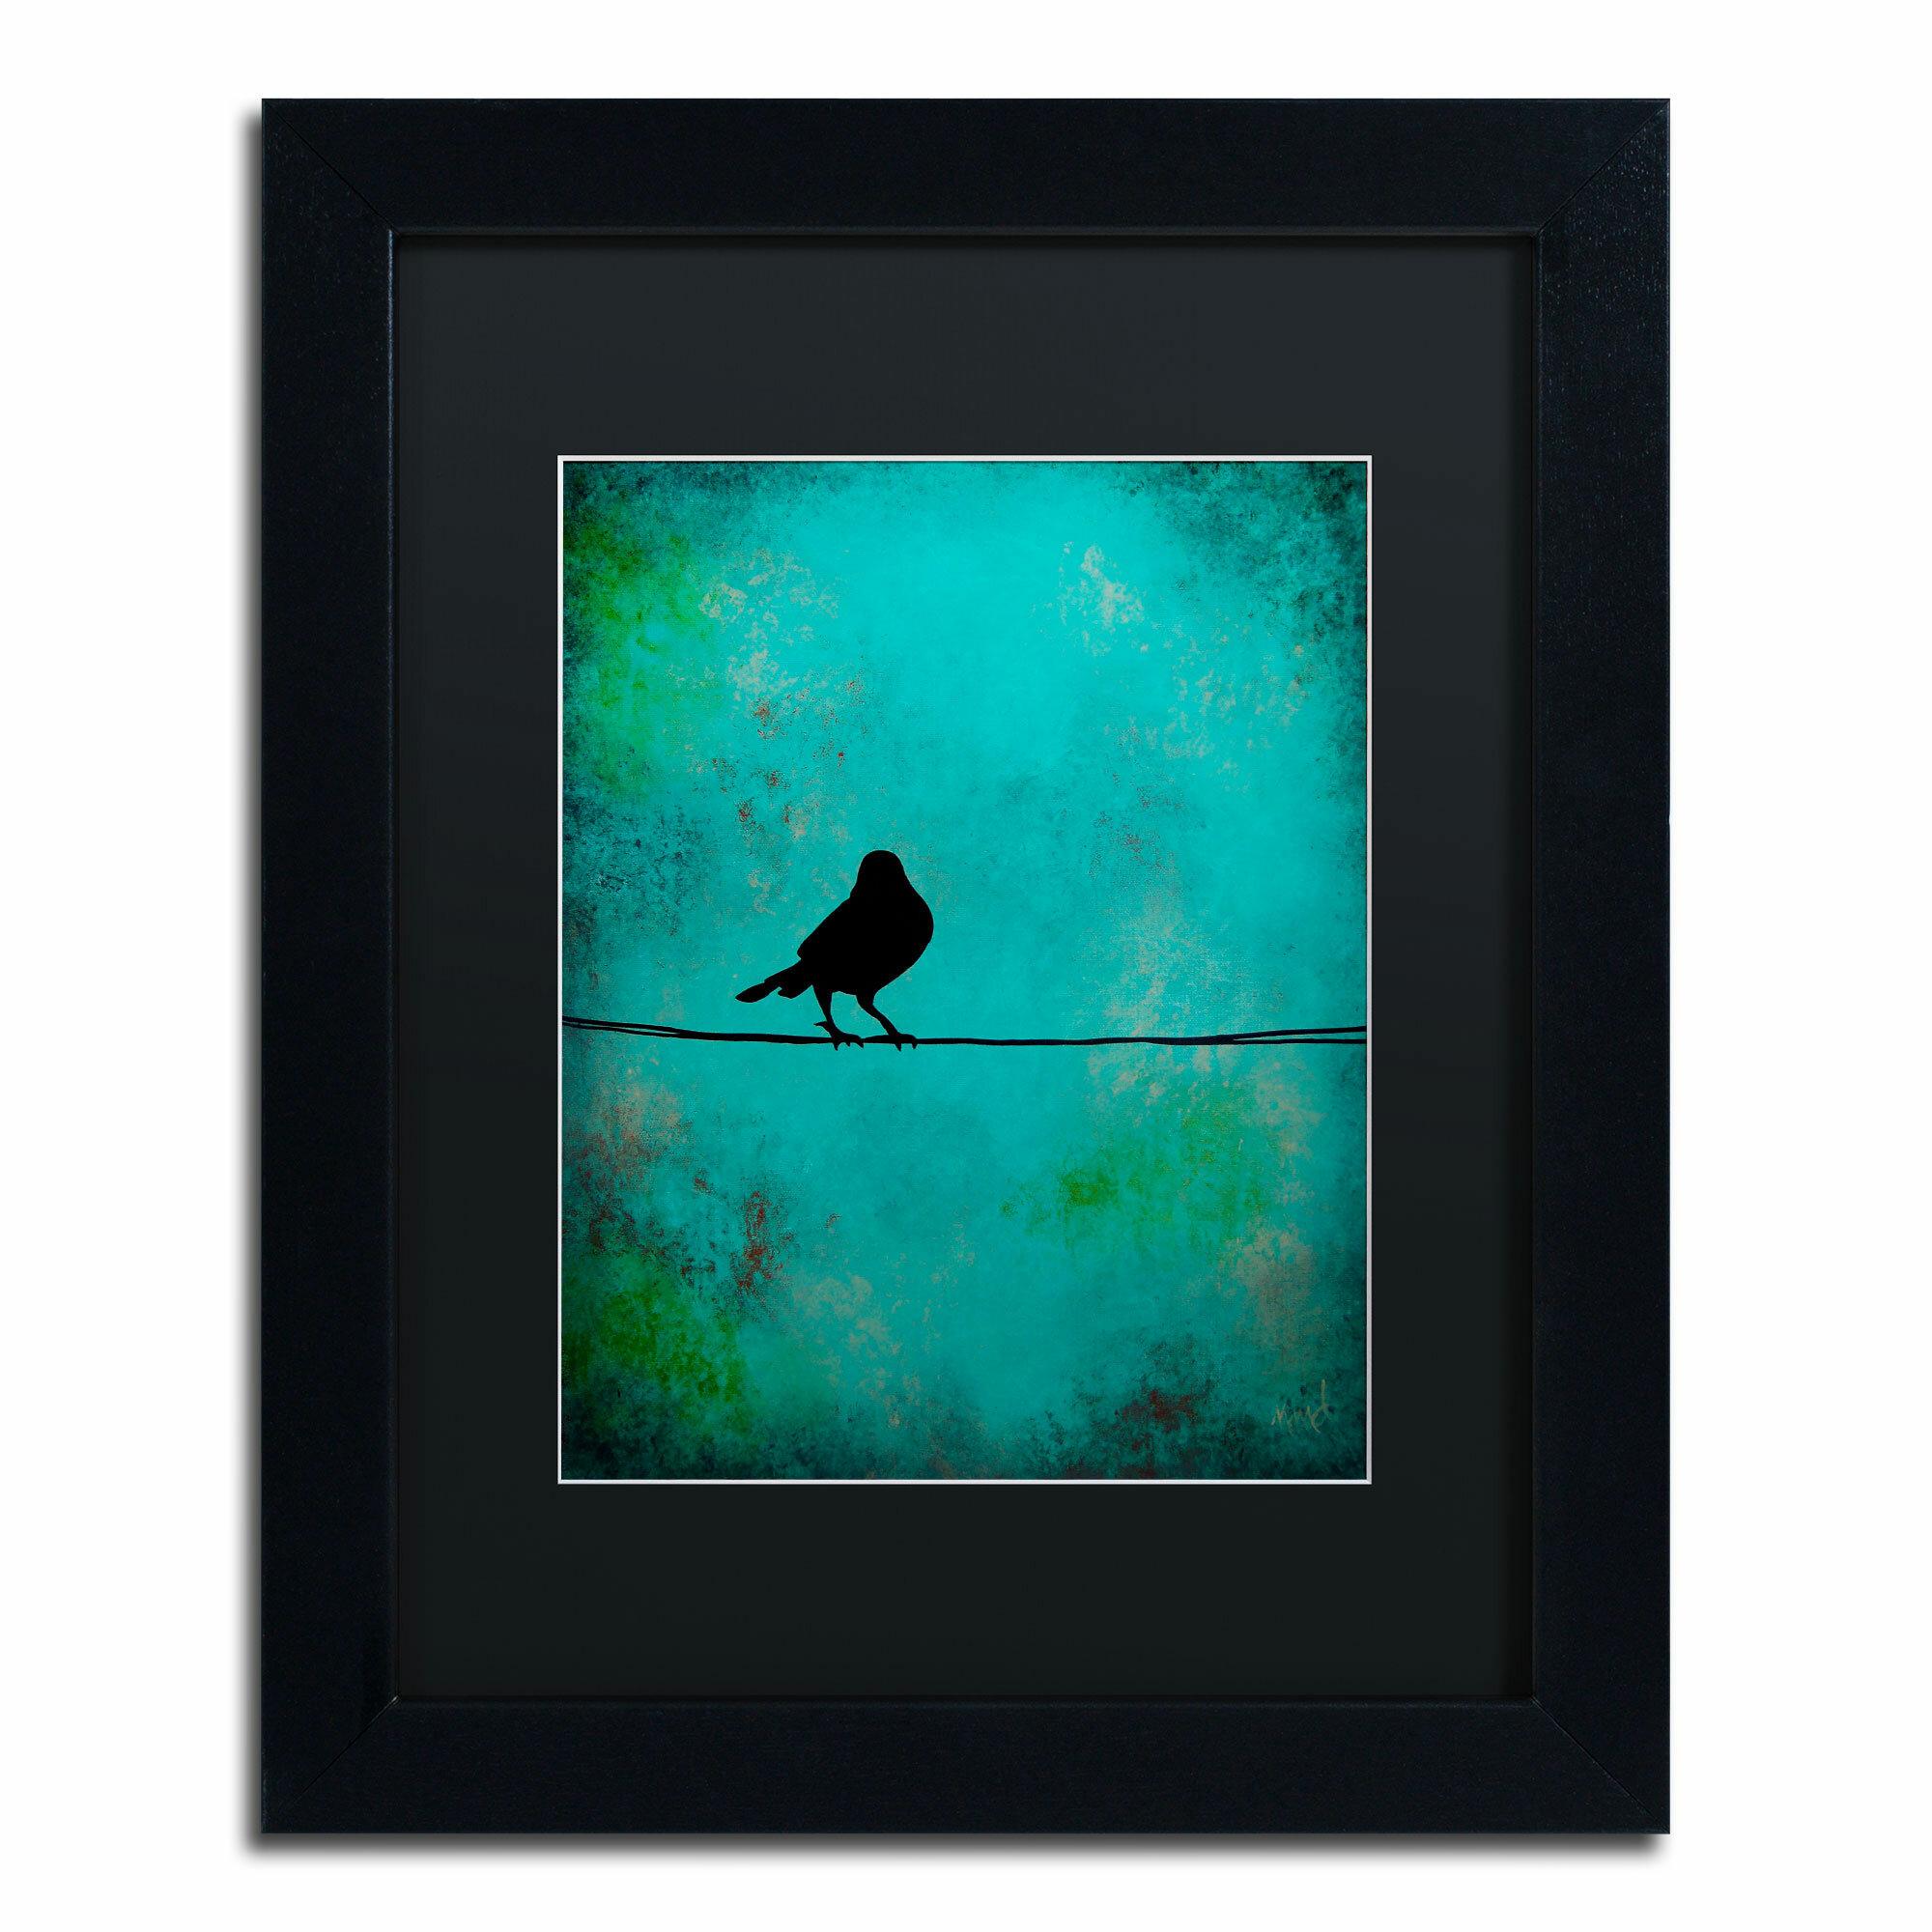 Trademark Art Bird S Attention By Nicole Dietz Framed Graphic Art Reviews Wayfair